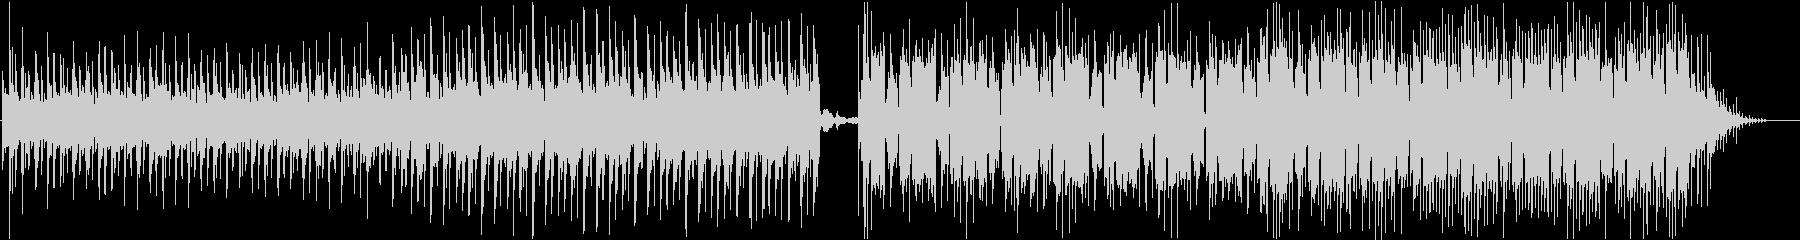 【EDM】チル感のFutureBassの未再生の波形